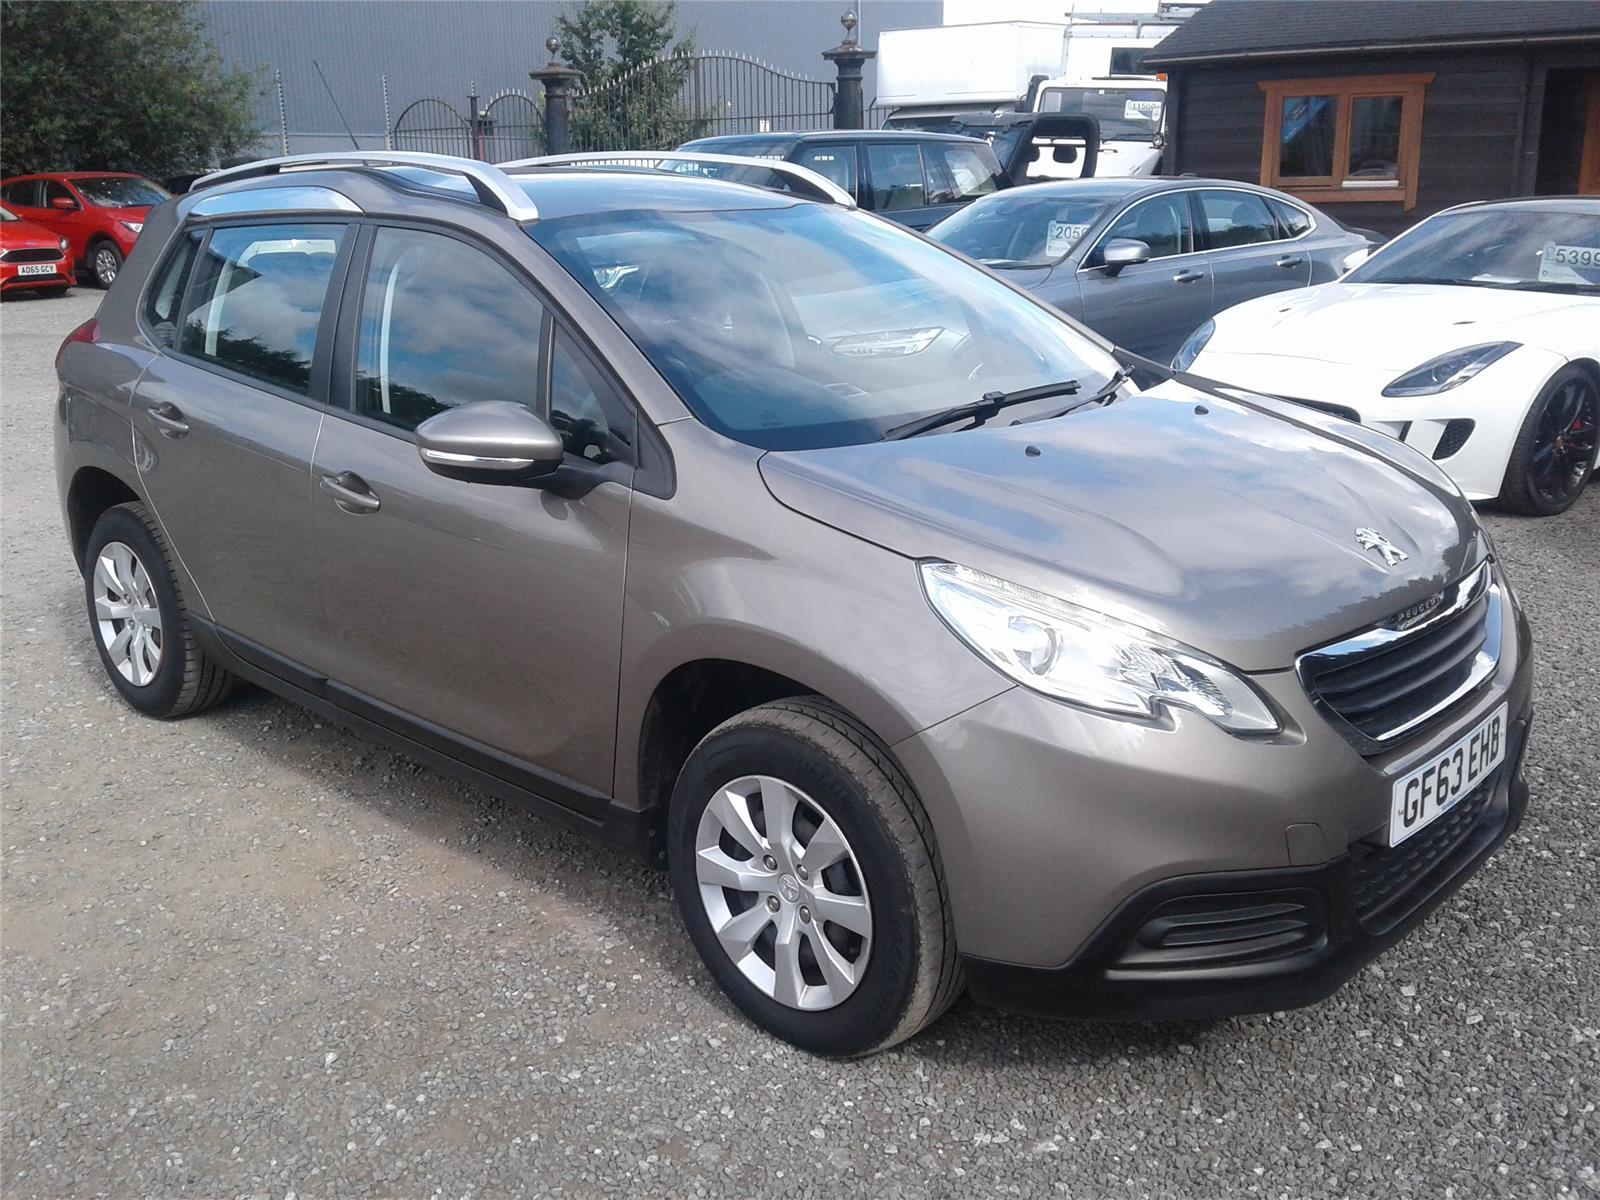 2013 Peugeot 2008 Access+ HDi 70 1398 Diesel Manual 5 Speed 5 Door Hatchback